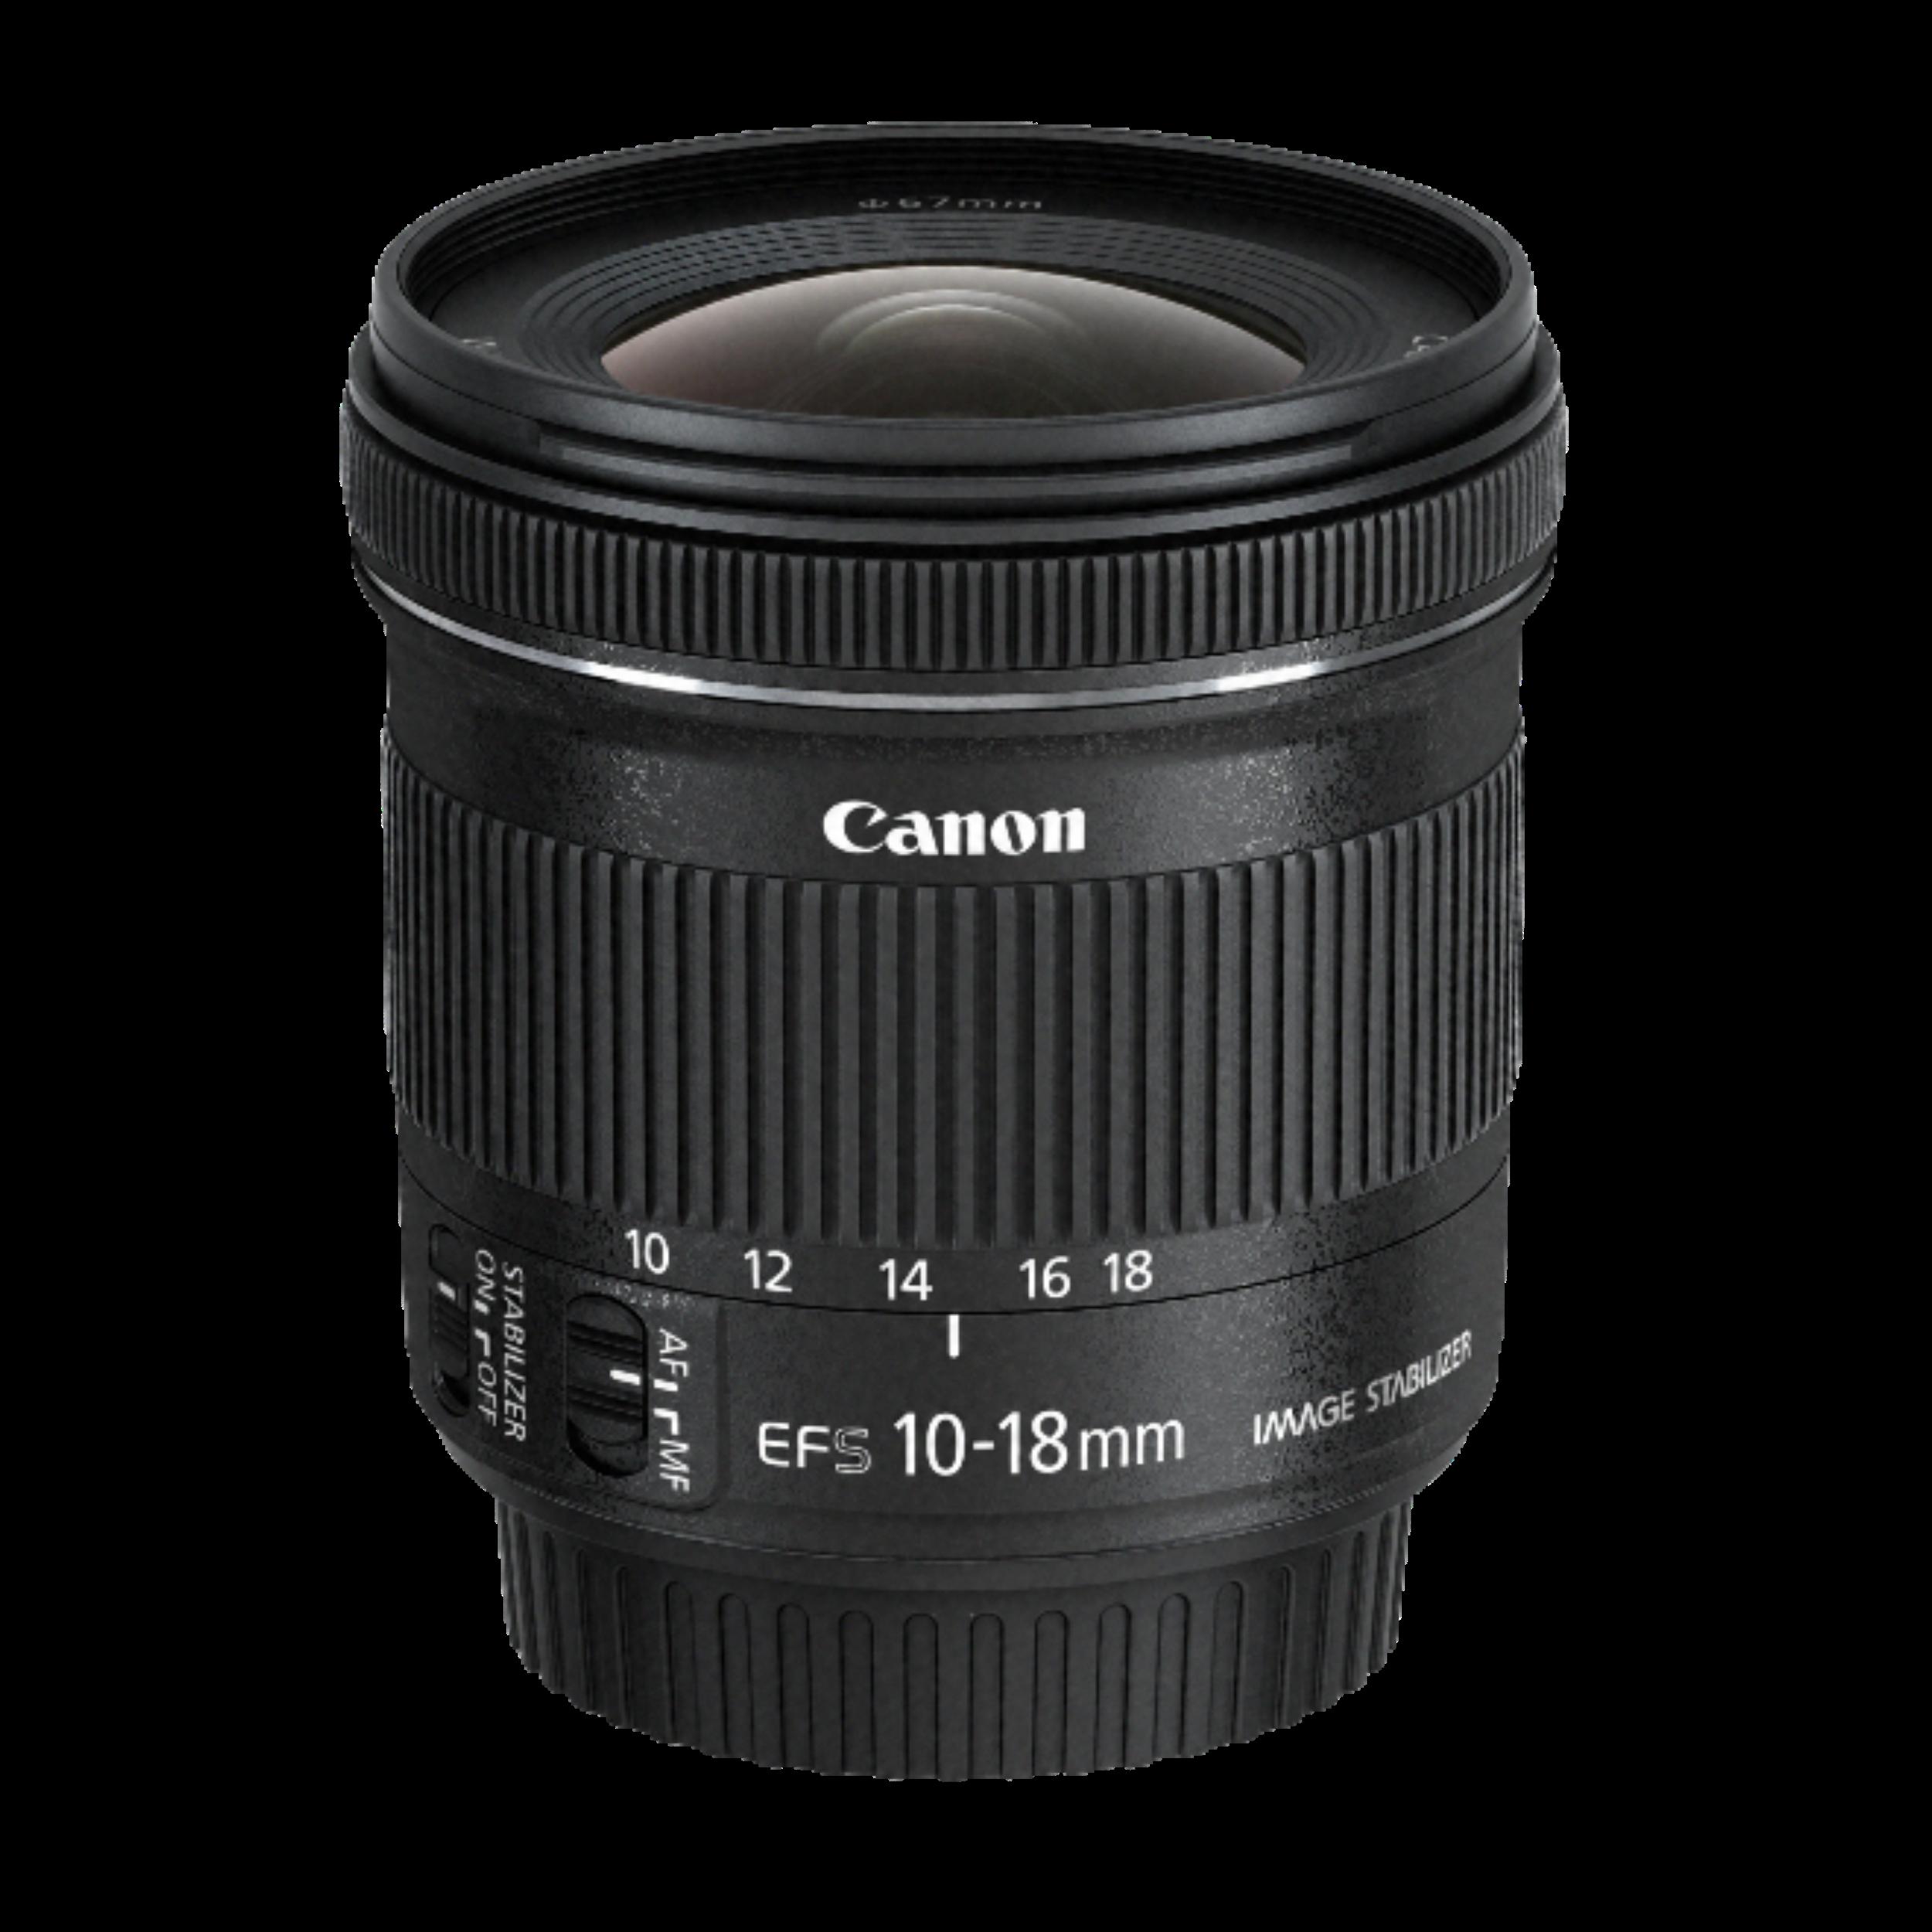 Canon 10-18mm f/4.5-5.6 - Canon EF-S